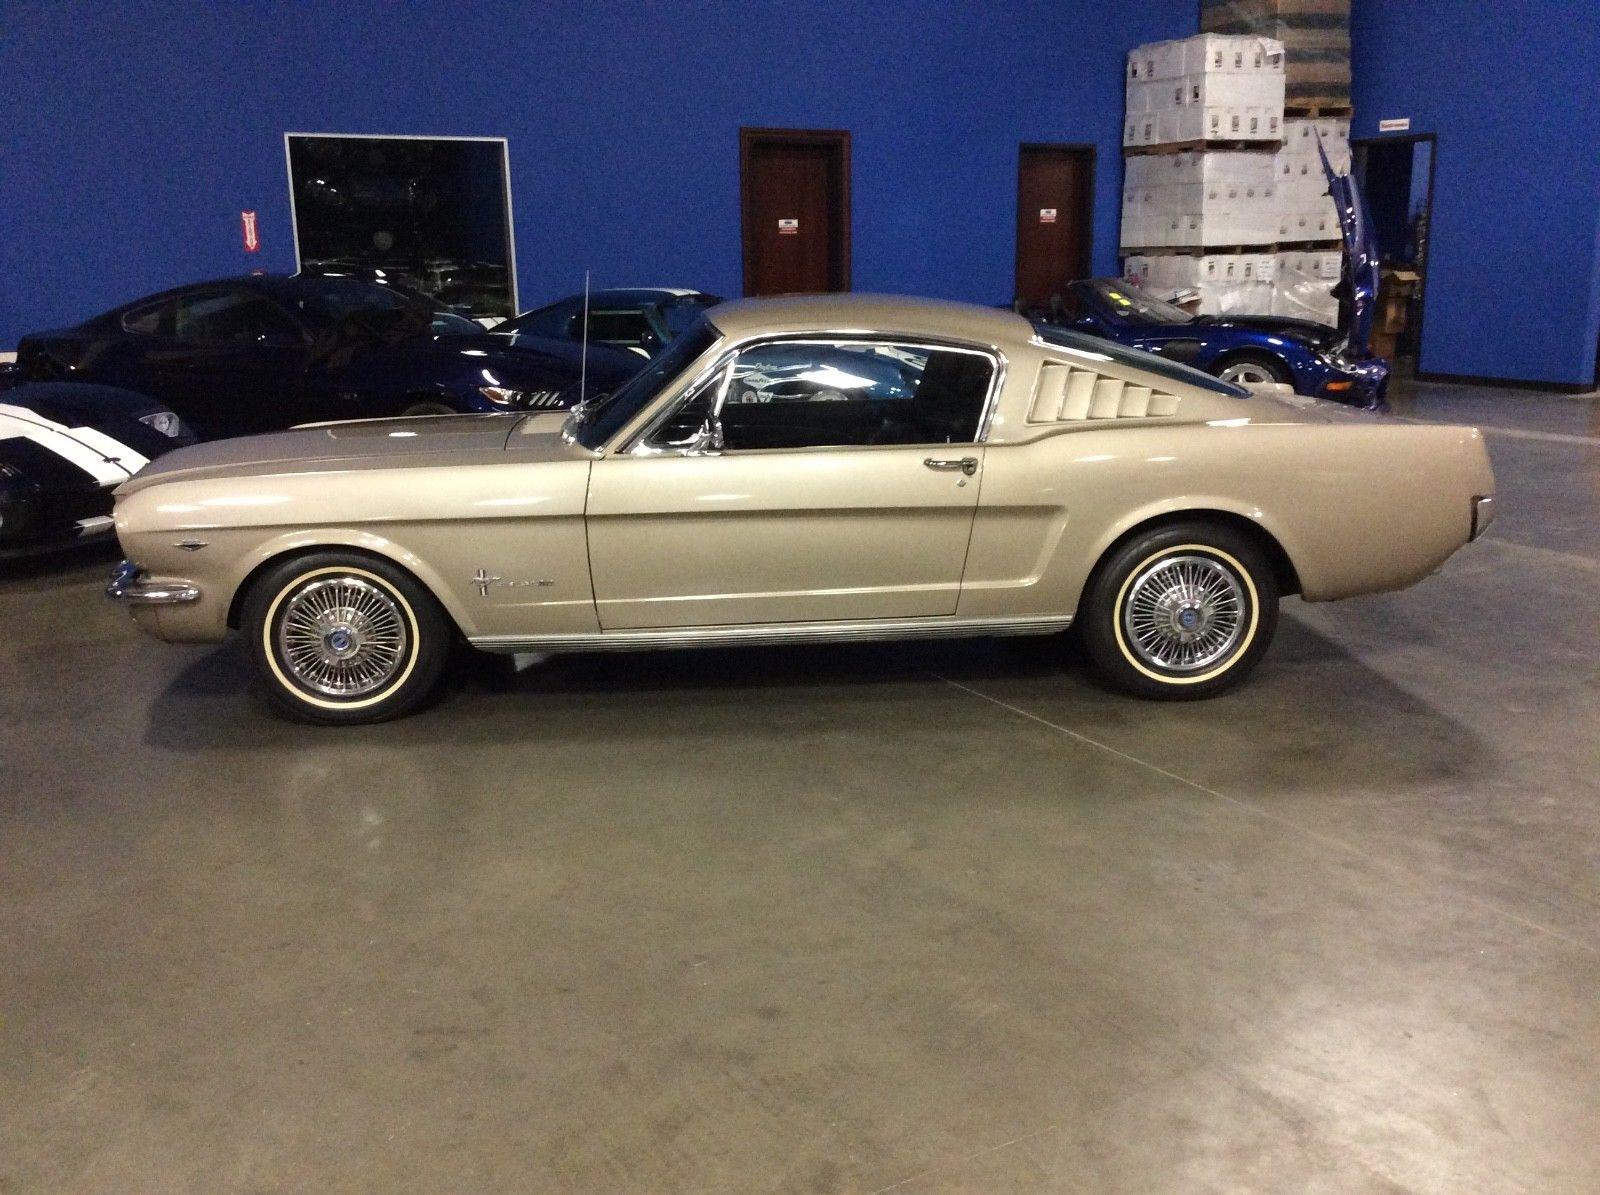 1965 Ford Mustang Fastback.jpg